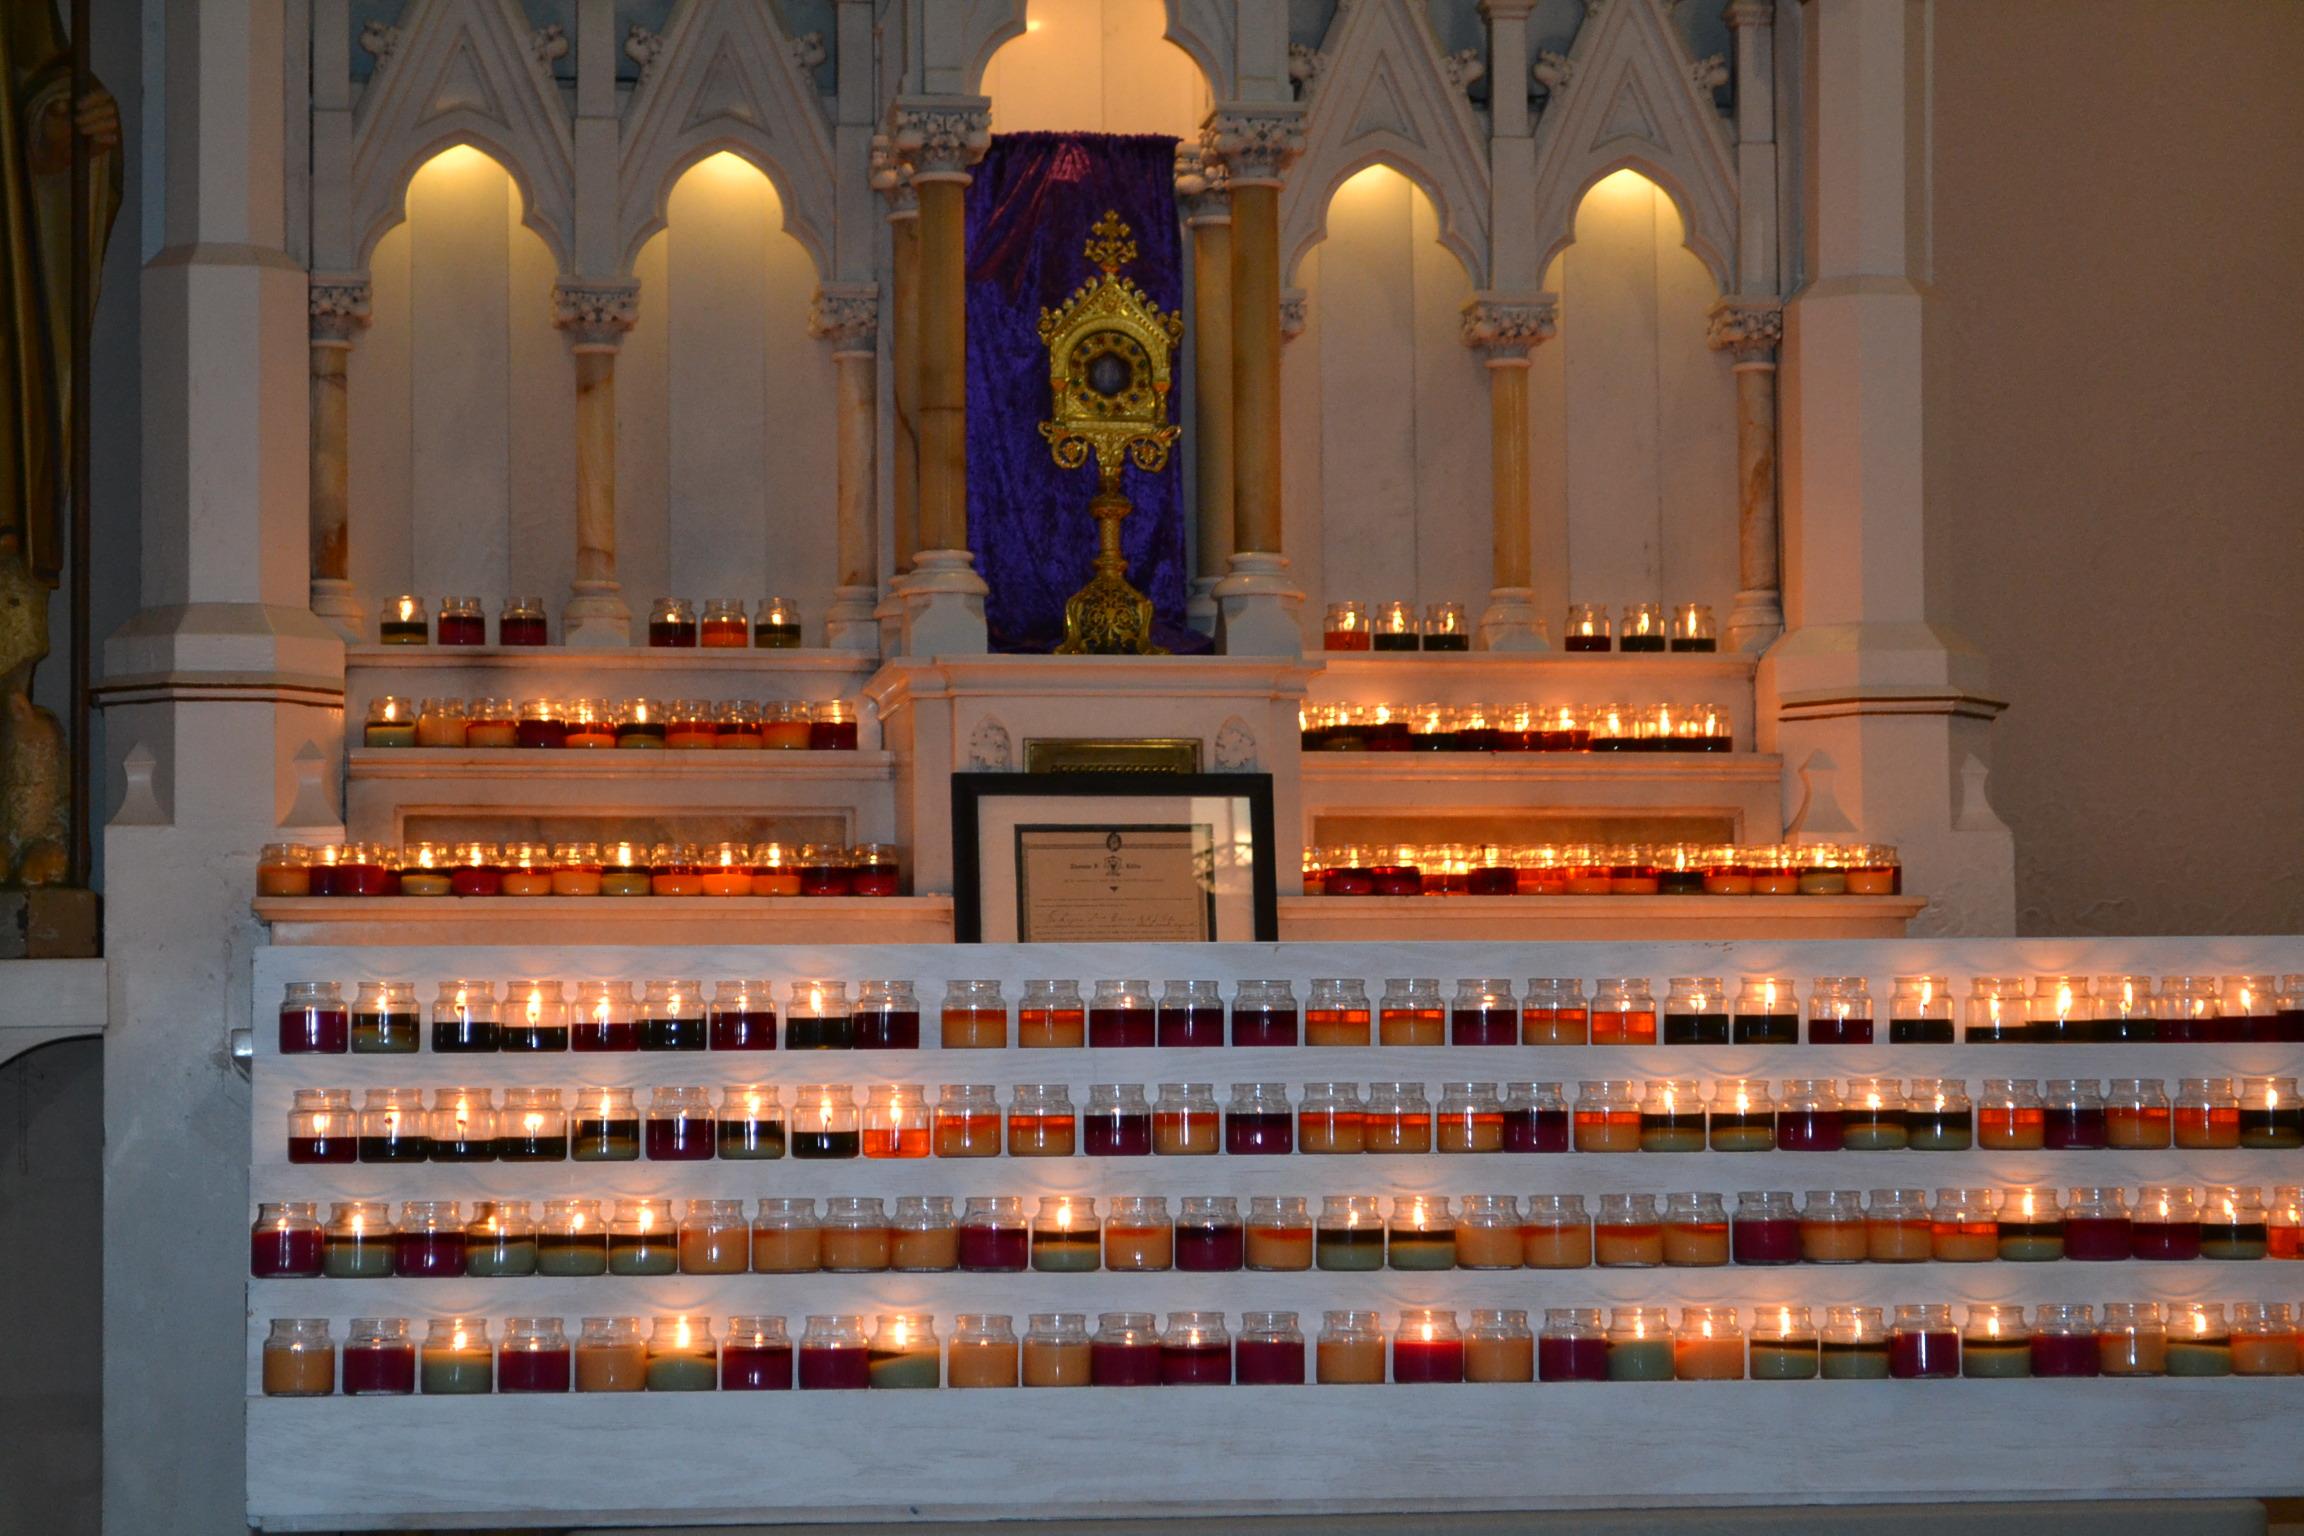 Upon entering the church, pilgrims left lit candles inn the sanctuary (CT Photo/Greg Hartman)